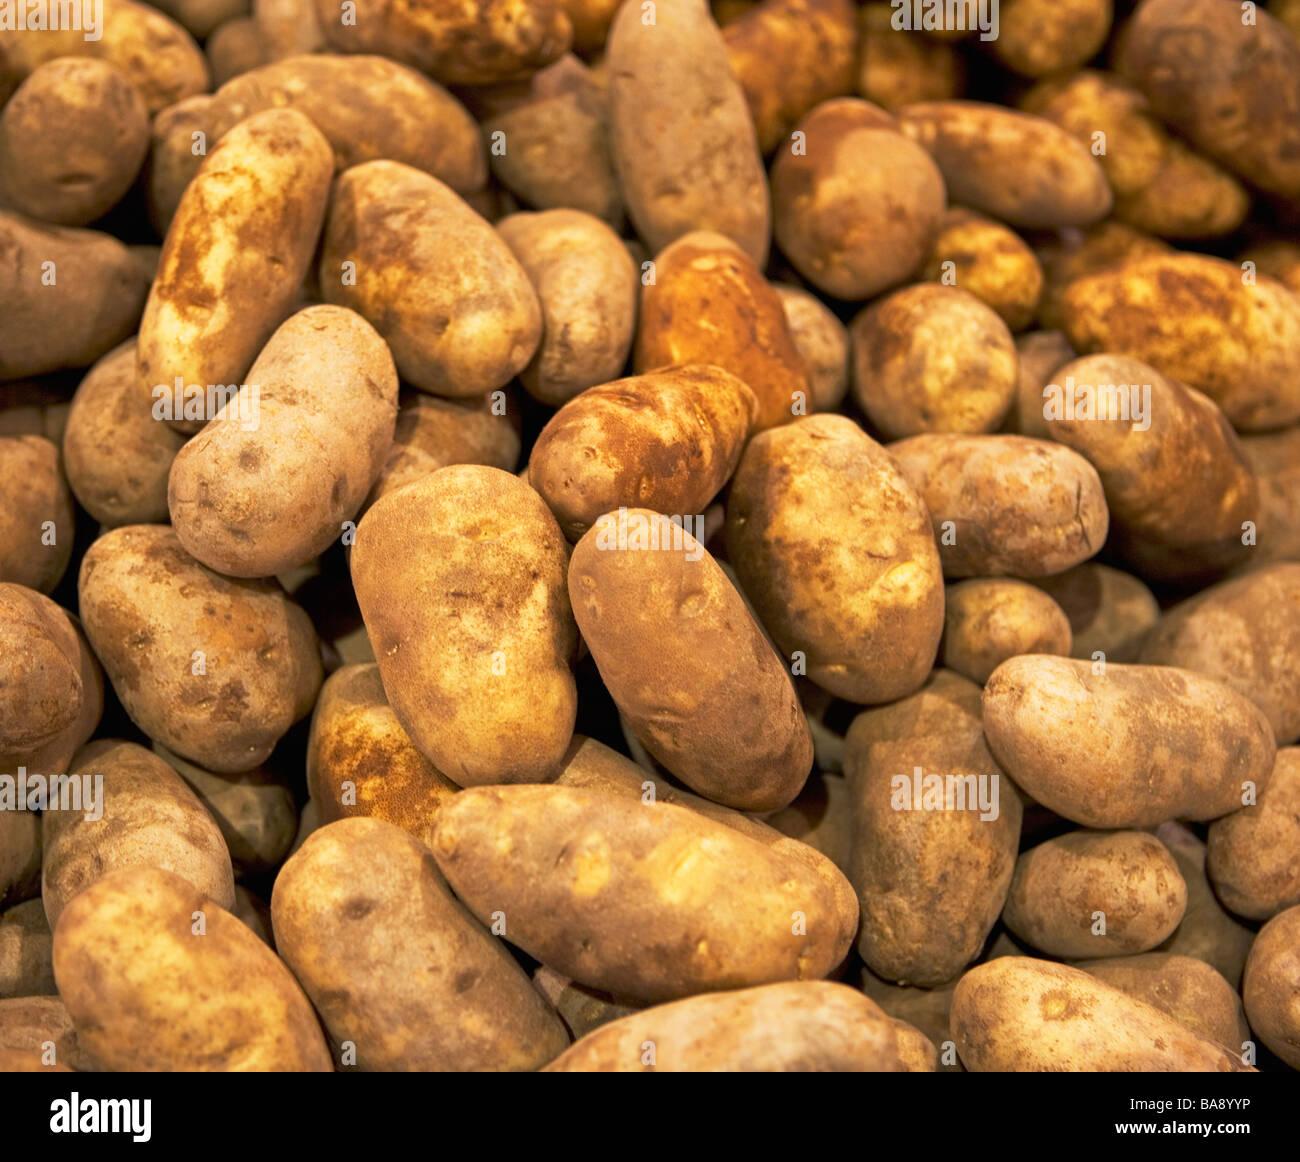 Idaho potatoes at a fruit stand - Stock Image